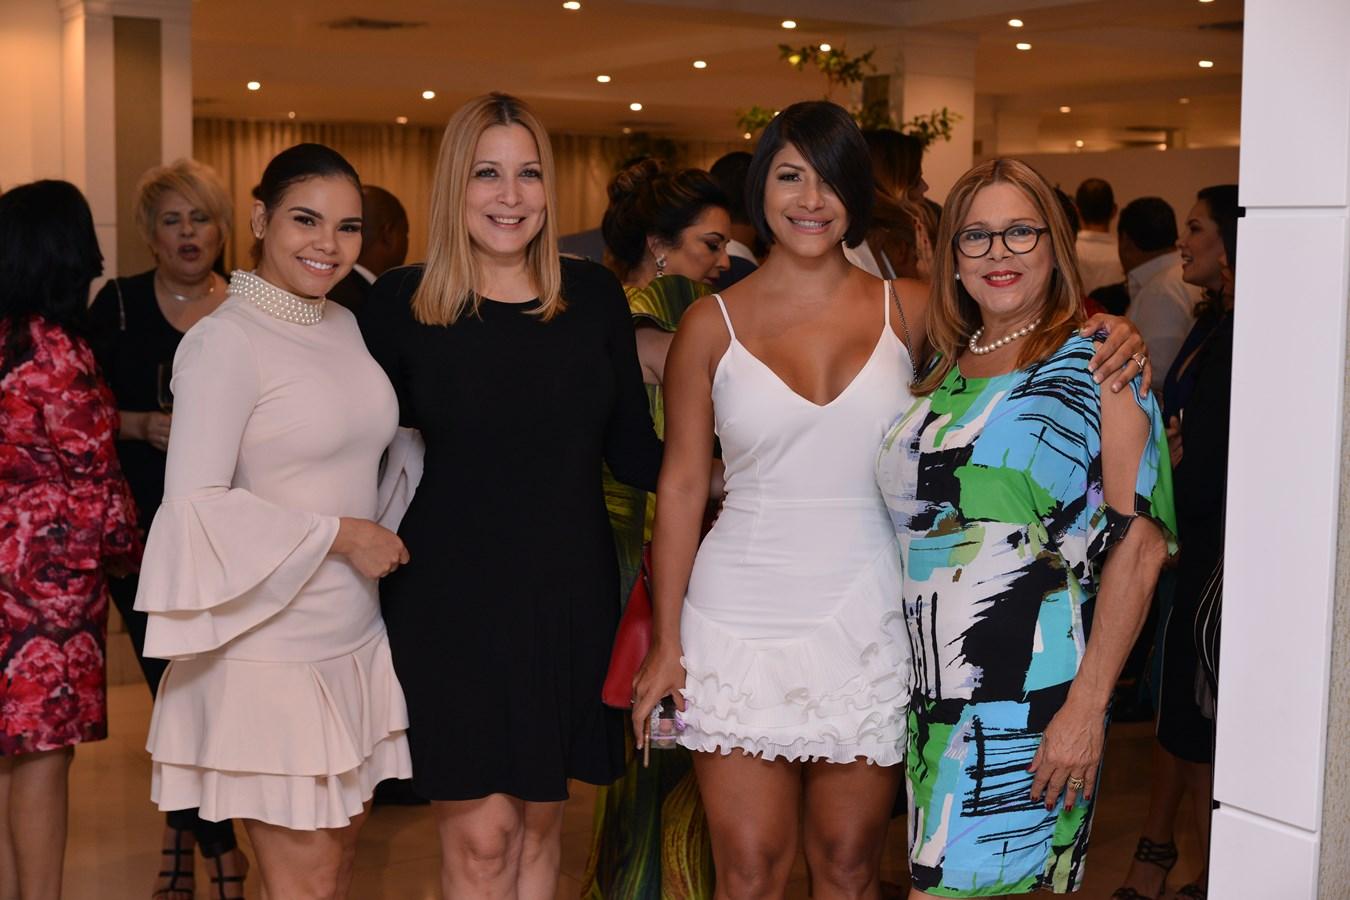 Vitaly Sánchez, Carolina Valenzuela, Arisleyda Villalona y Carmen Sosa